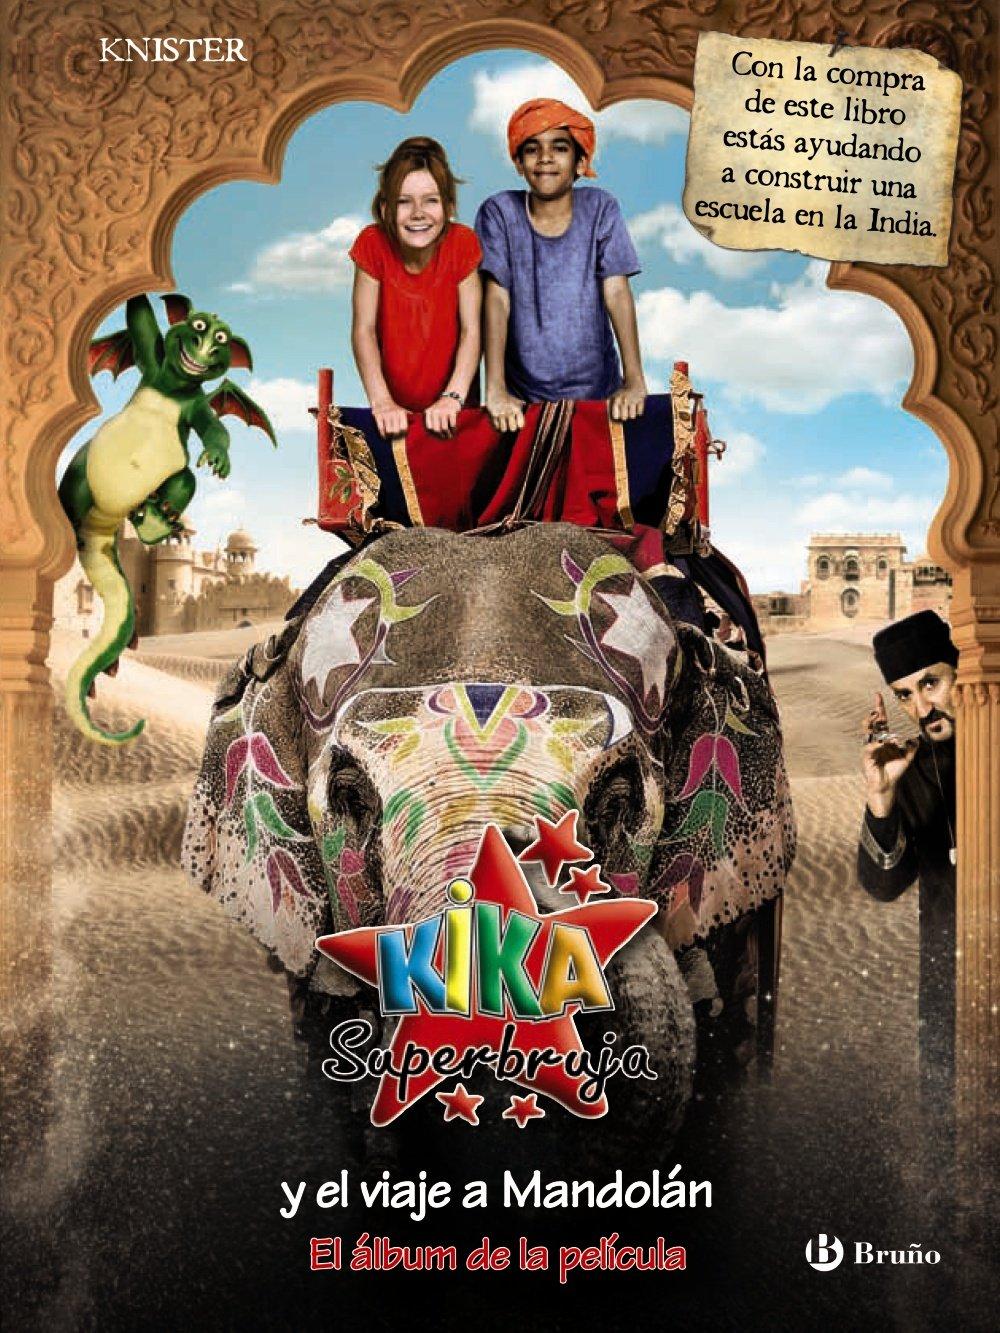 Kika Superbruja y el viaje a Mandolan / Lilli the Witch and the trip to Mandolan: El Album De La Pelicula / the Book Accompanying the Film (Kika Superbruja / Lilli the Witch) (Spanish Edition) pdf epub